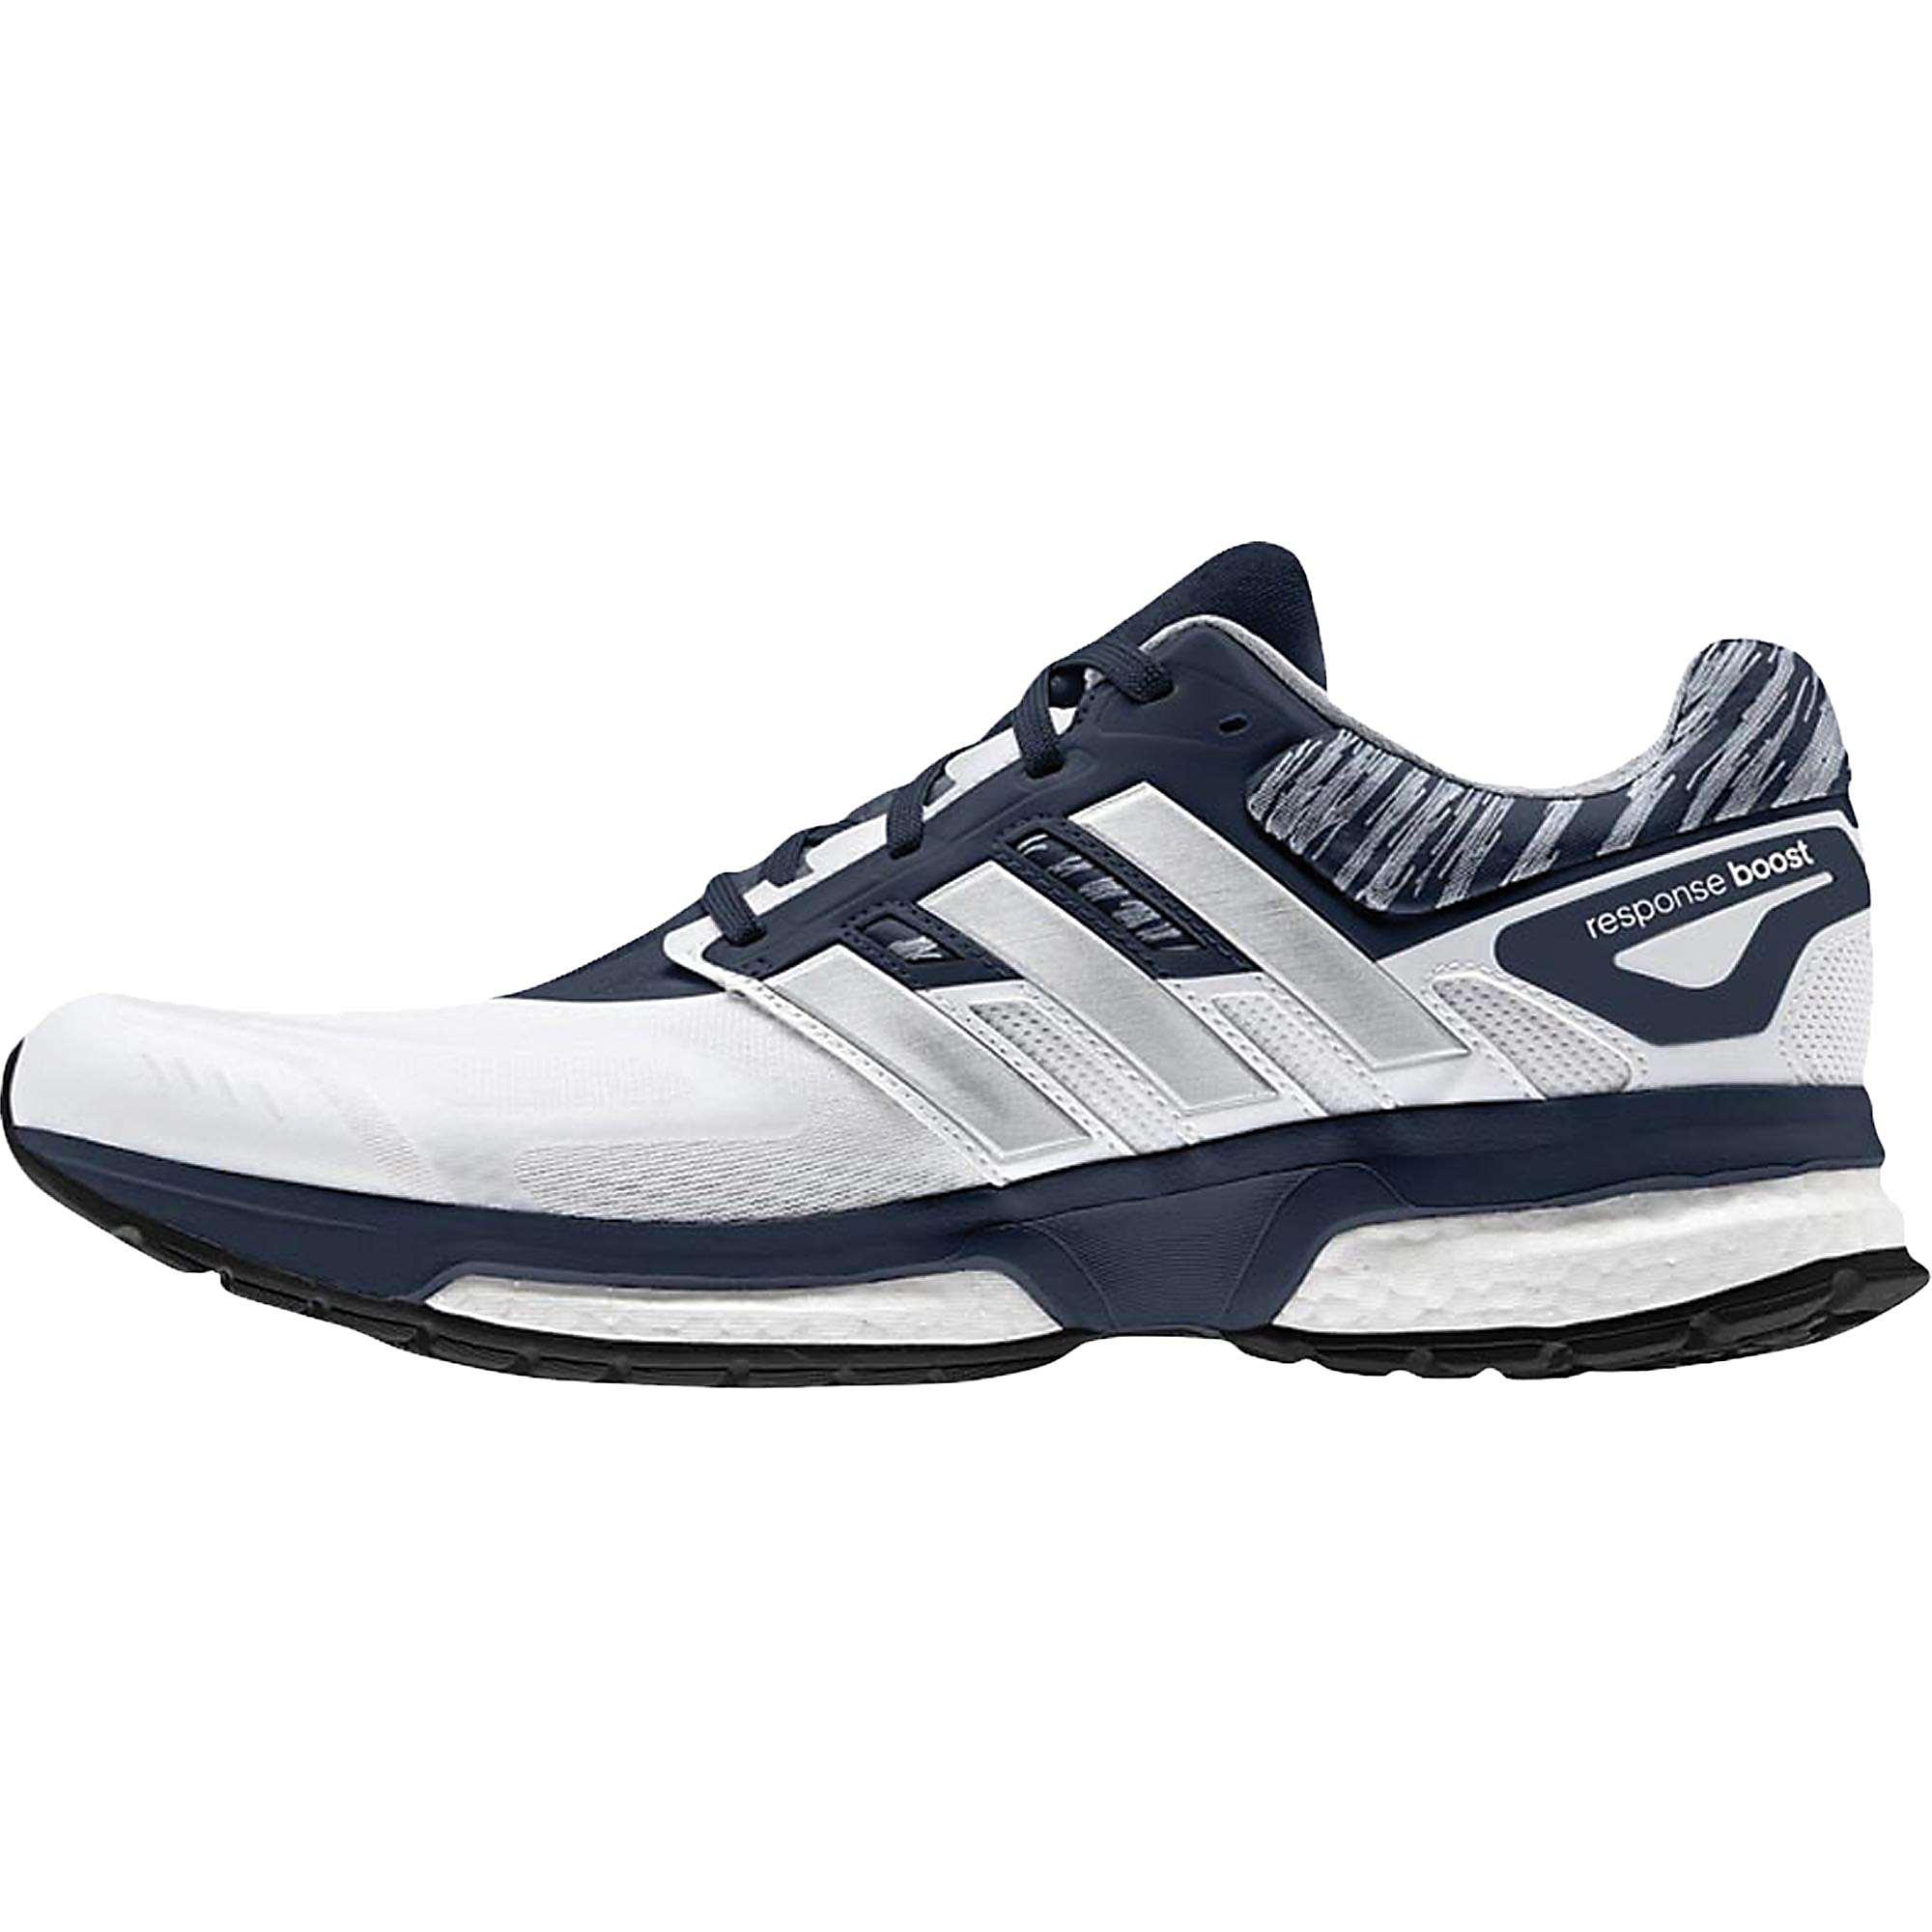 adidas boost men's running shoe